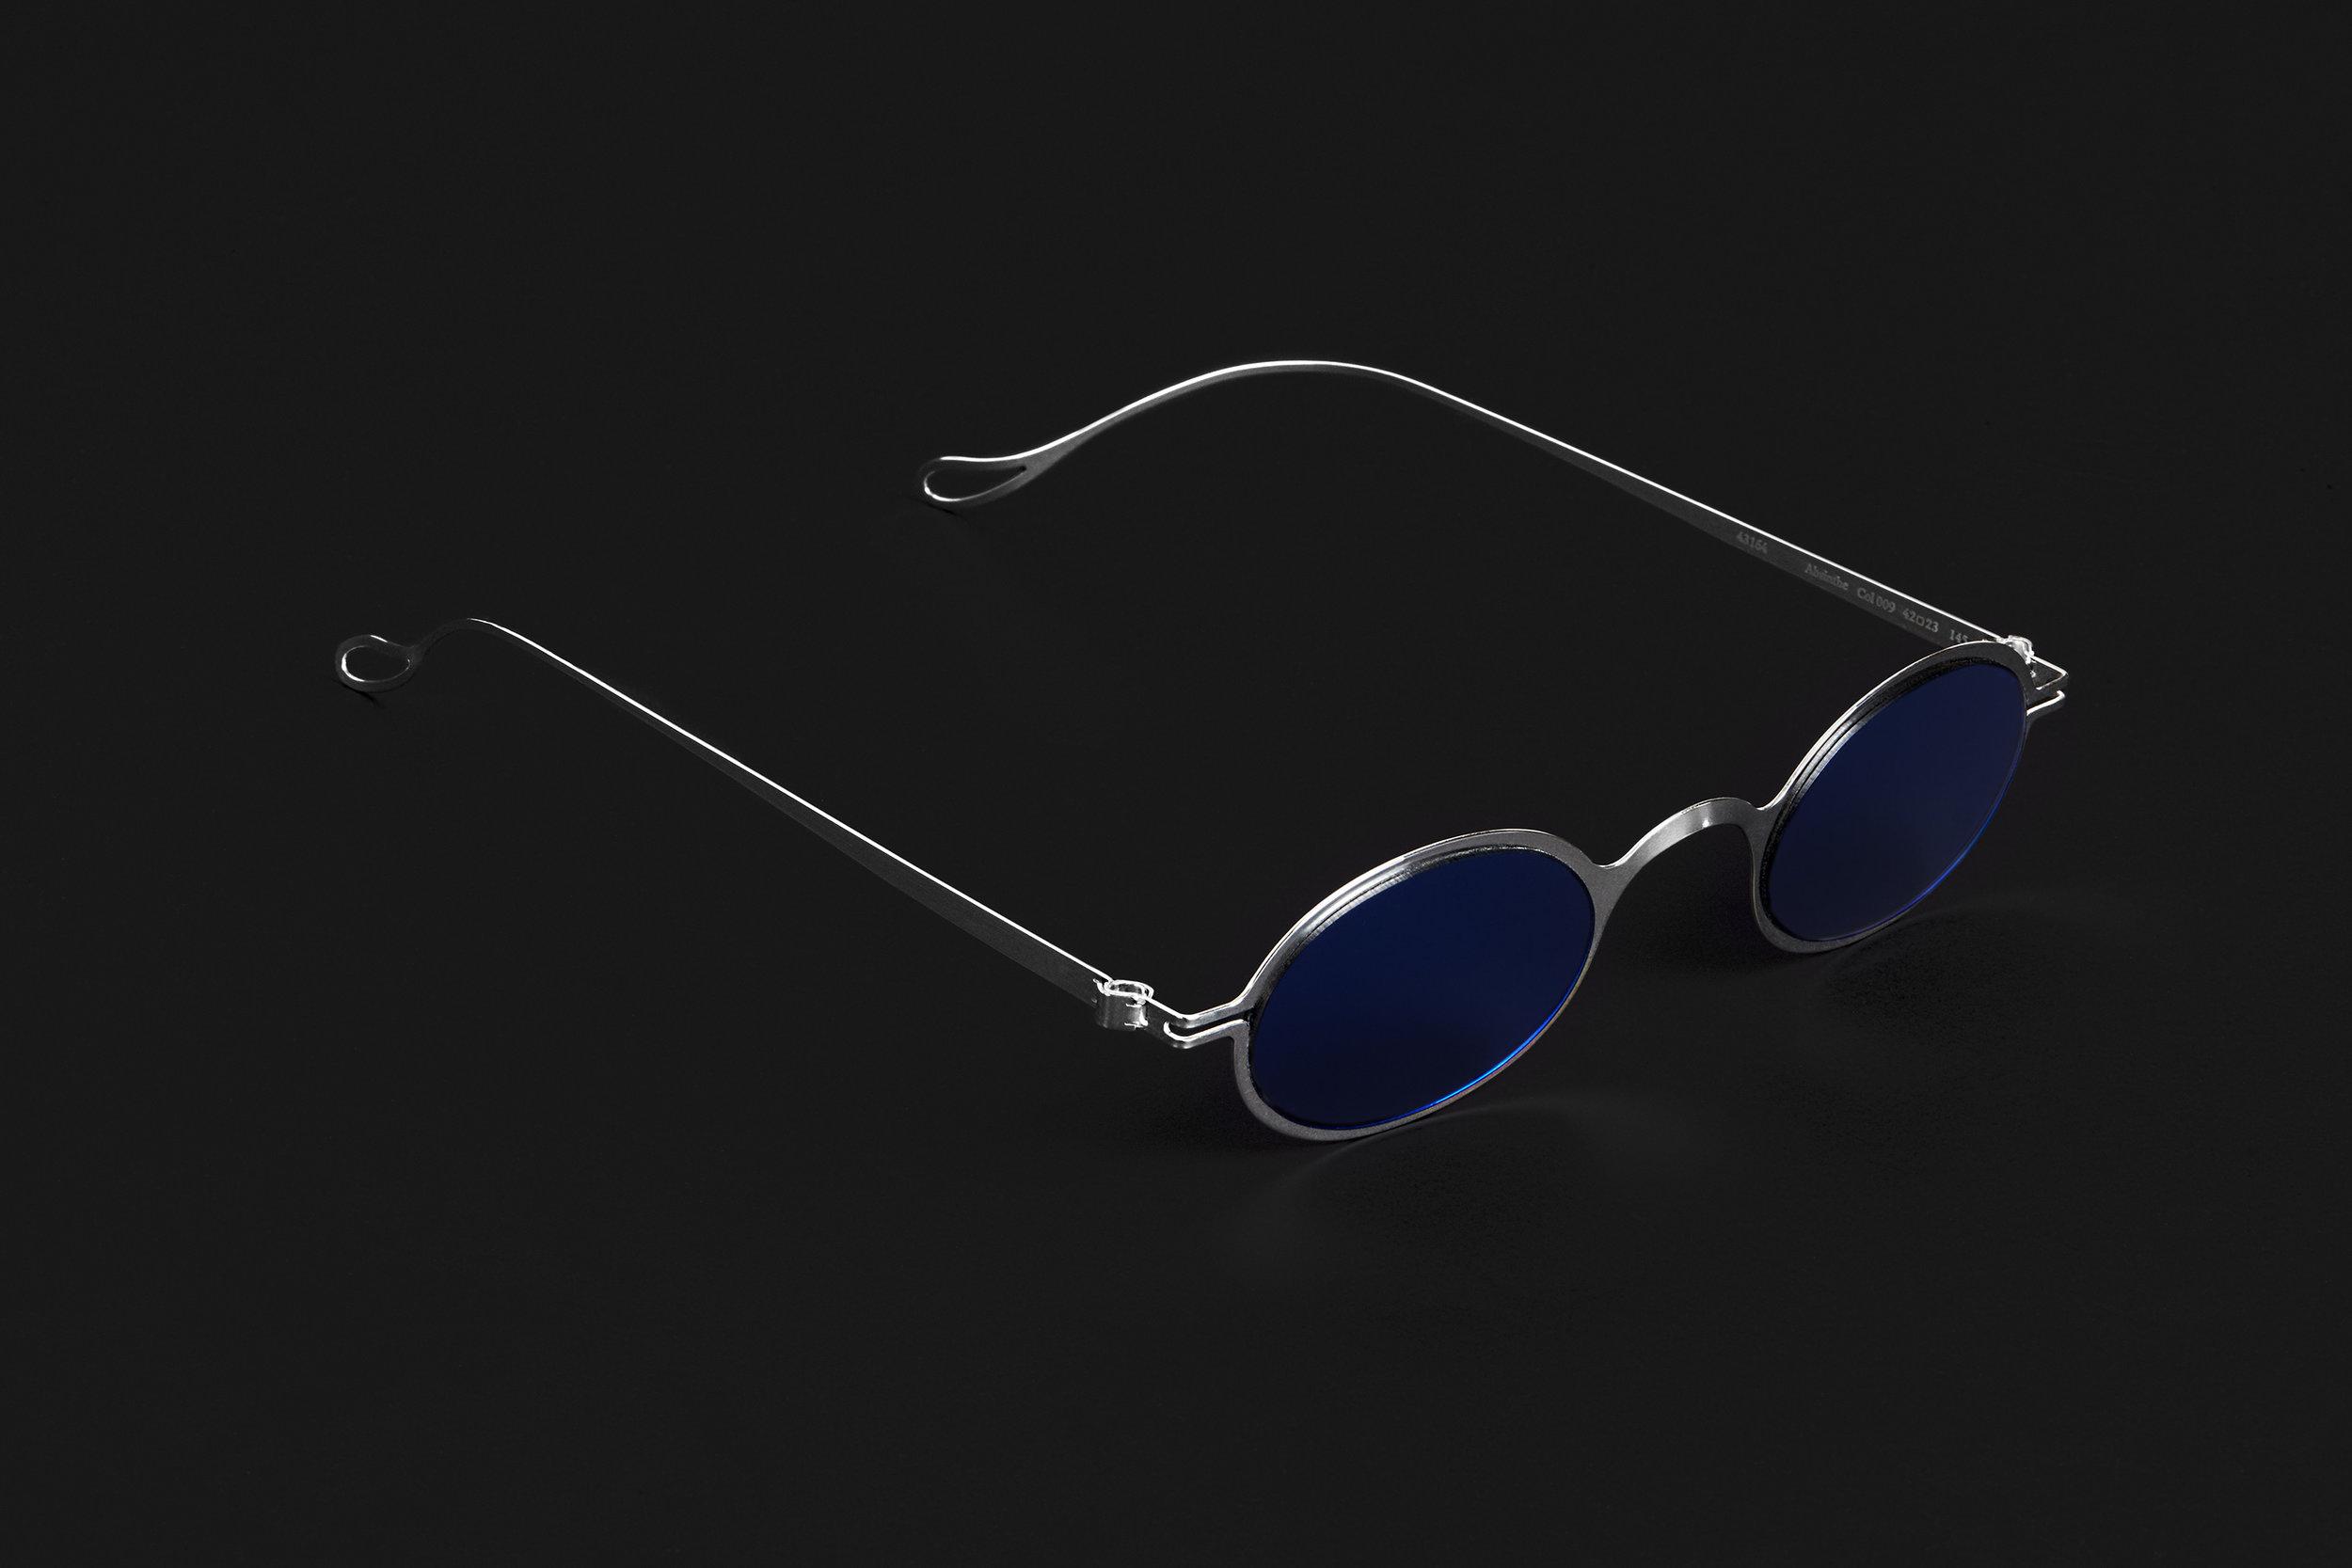 haffmans_neumeister_absinthe_argentum_litmus_blue_phasmid_sunglasses_angle_102221.jpg